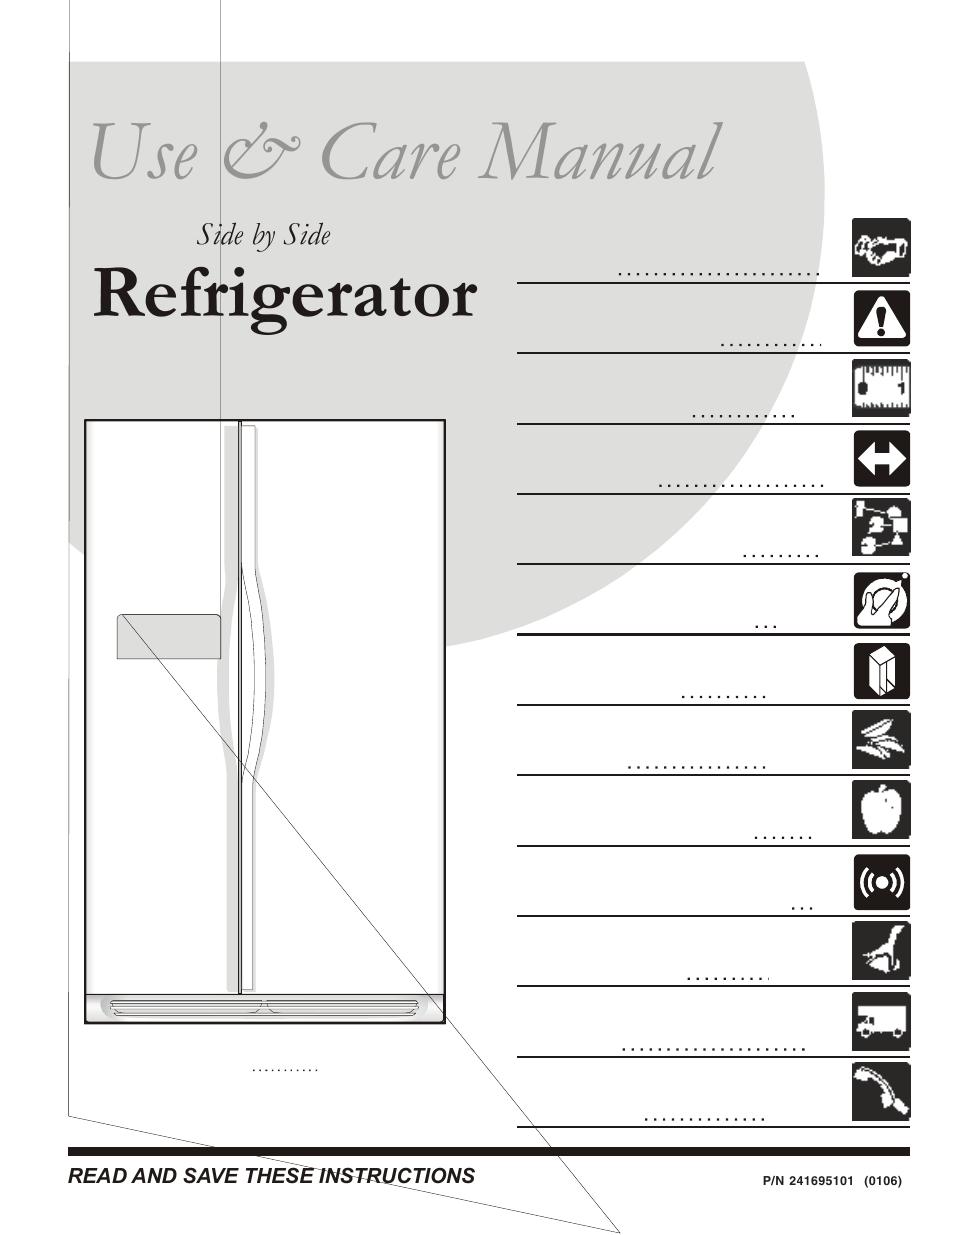 Frigidaire Refrigerator Espaol 27 User Manual 26 Pages